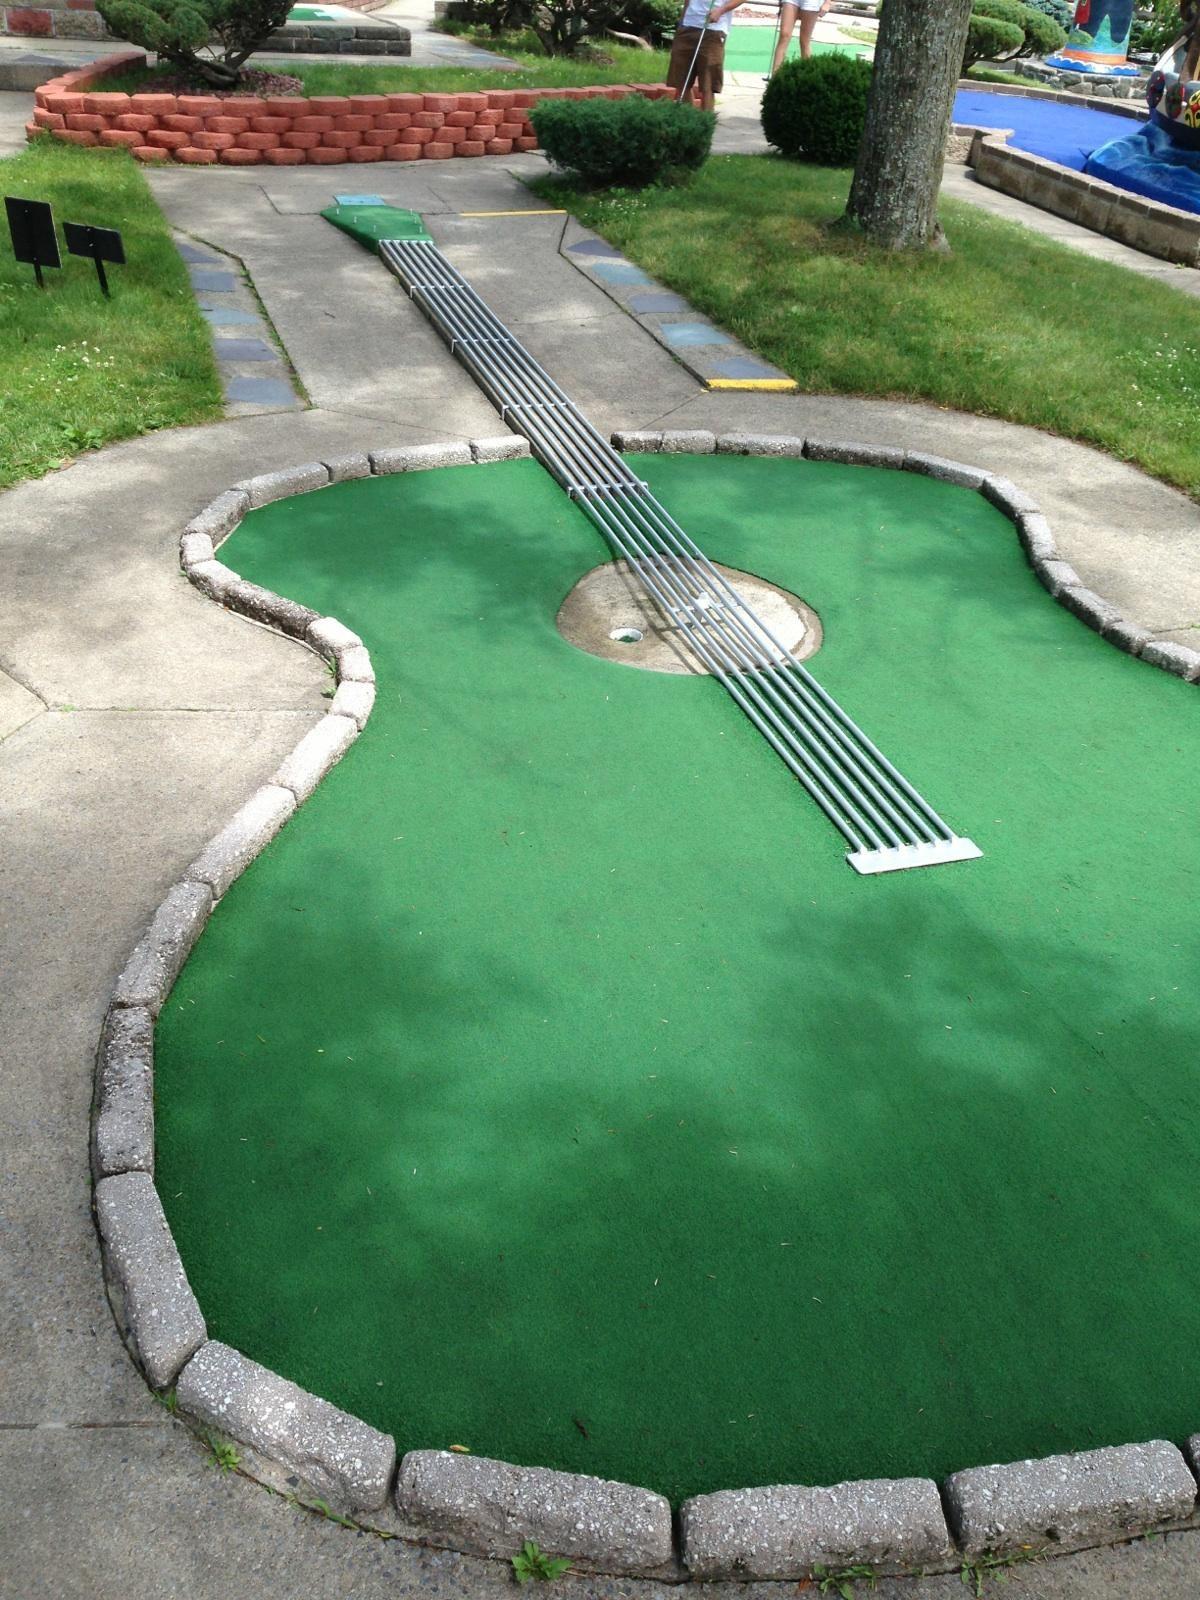 Mini Golf! Lake George, NY - Mini Golf - Summer 2013 Trip #golf  #lorisgolfshoppe - Mini Golf! Lake George, NY - Mini Golf - Summer 2013 Trip #golf